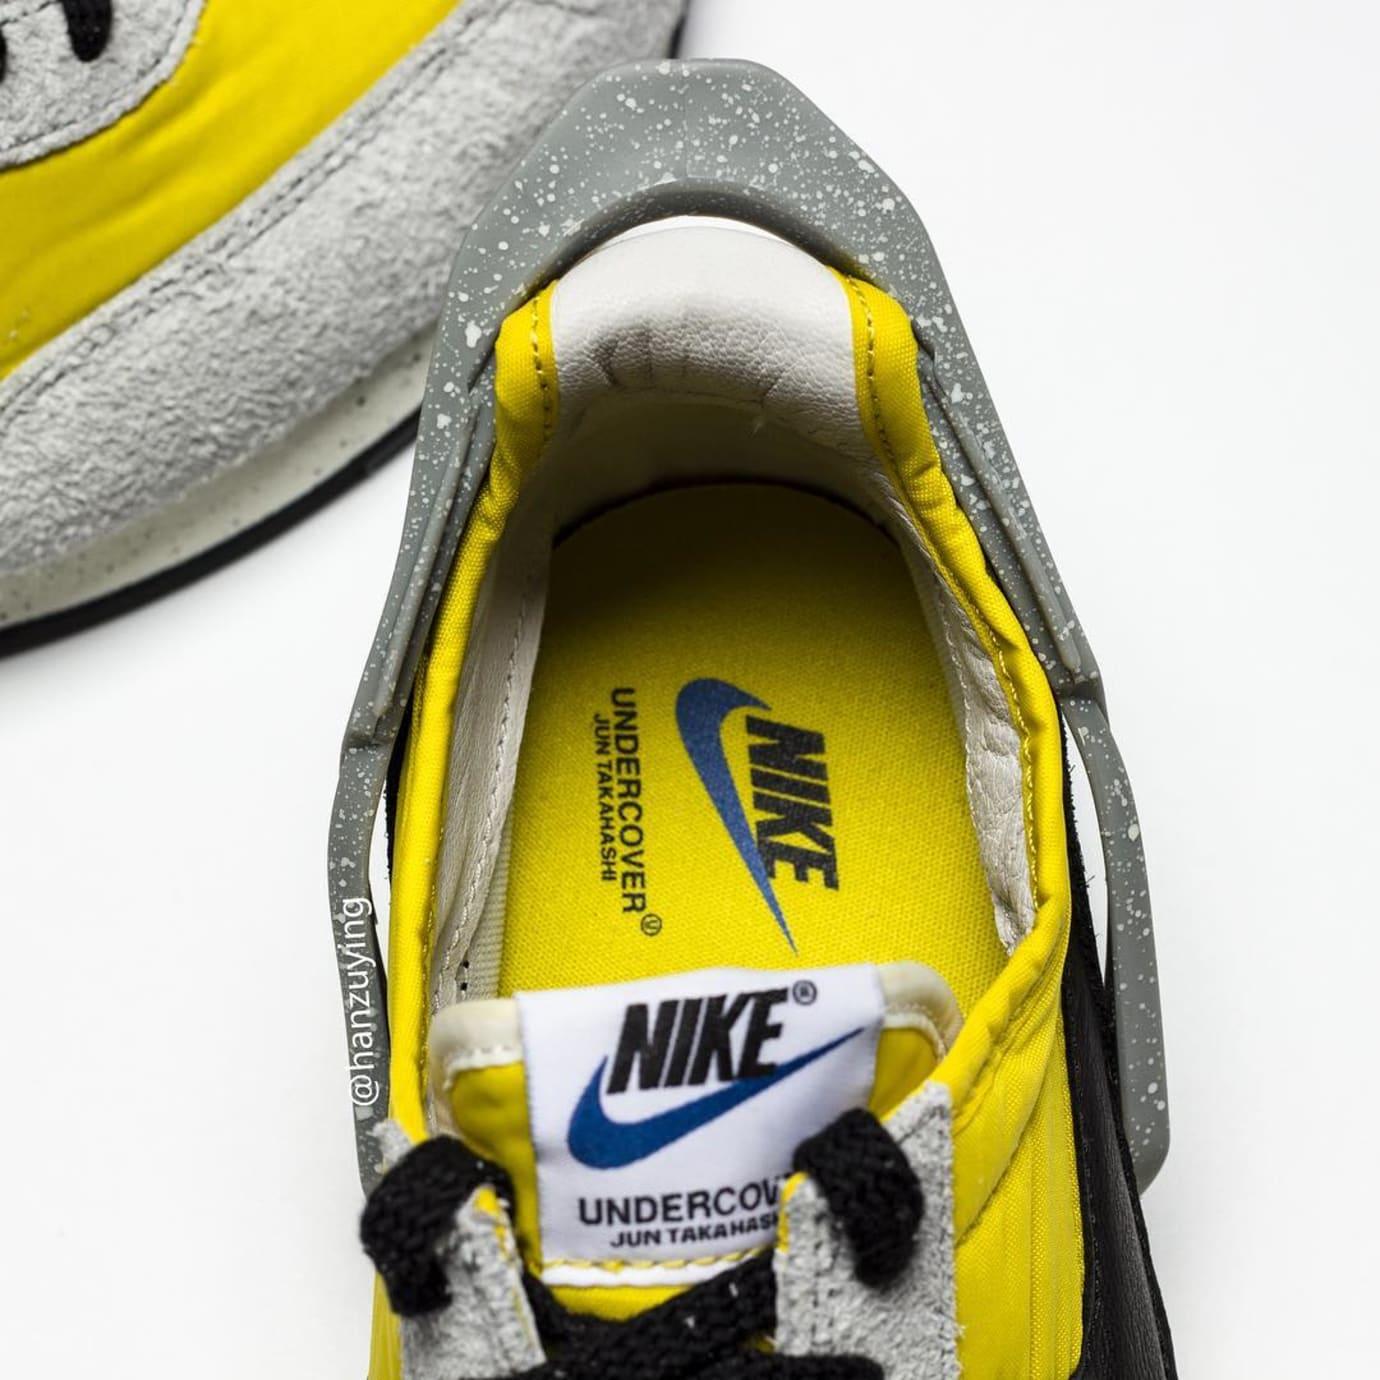 Undercover x Nike Daybreak Yellow/Grey BV4594-700 Insole